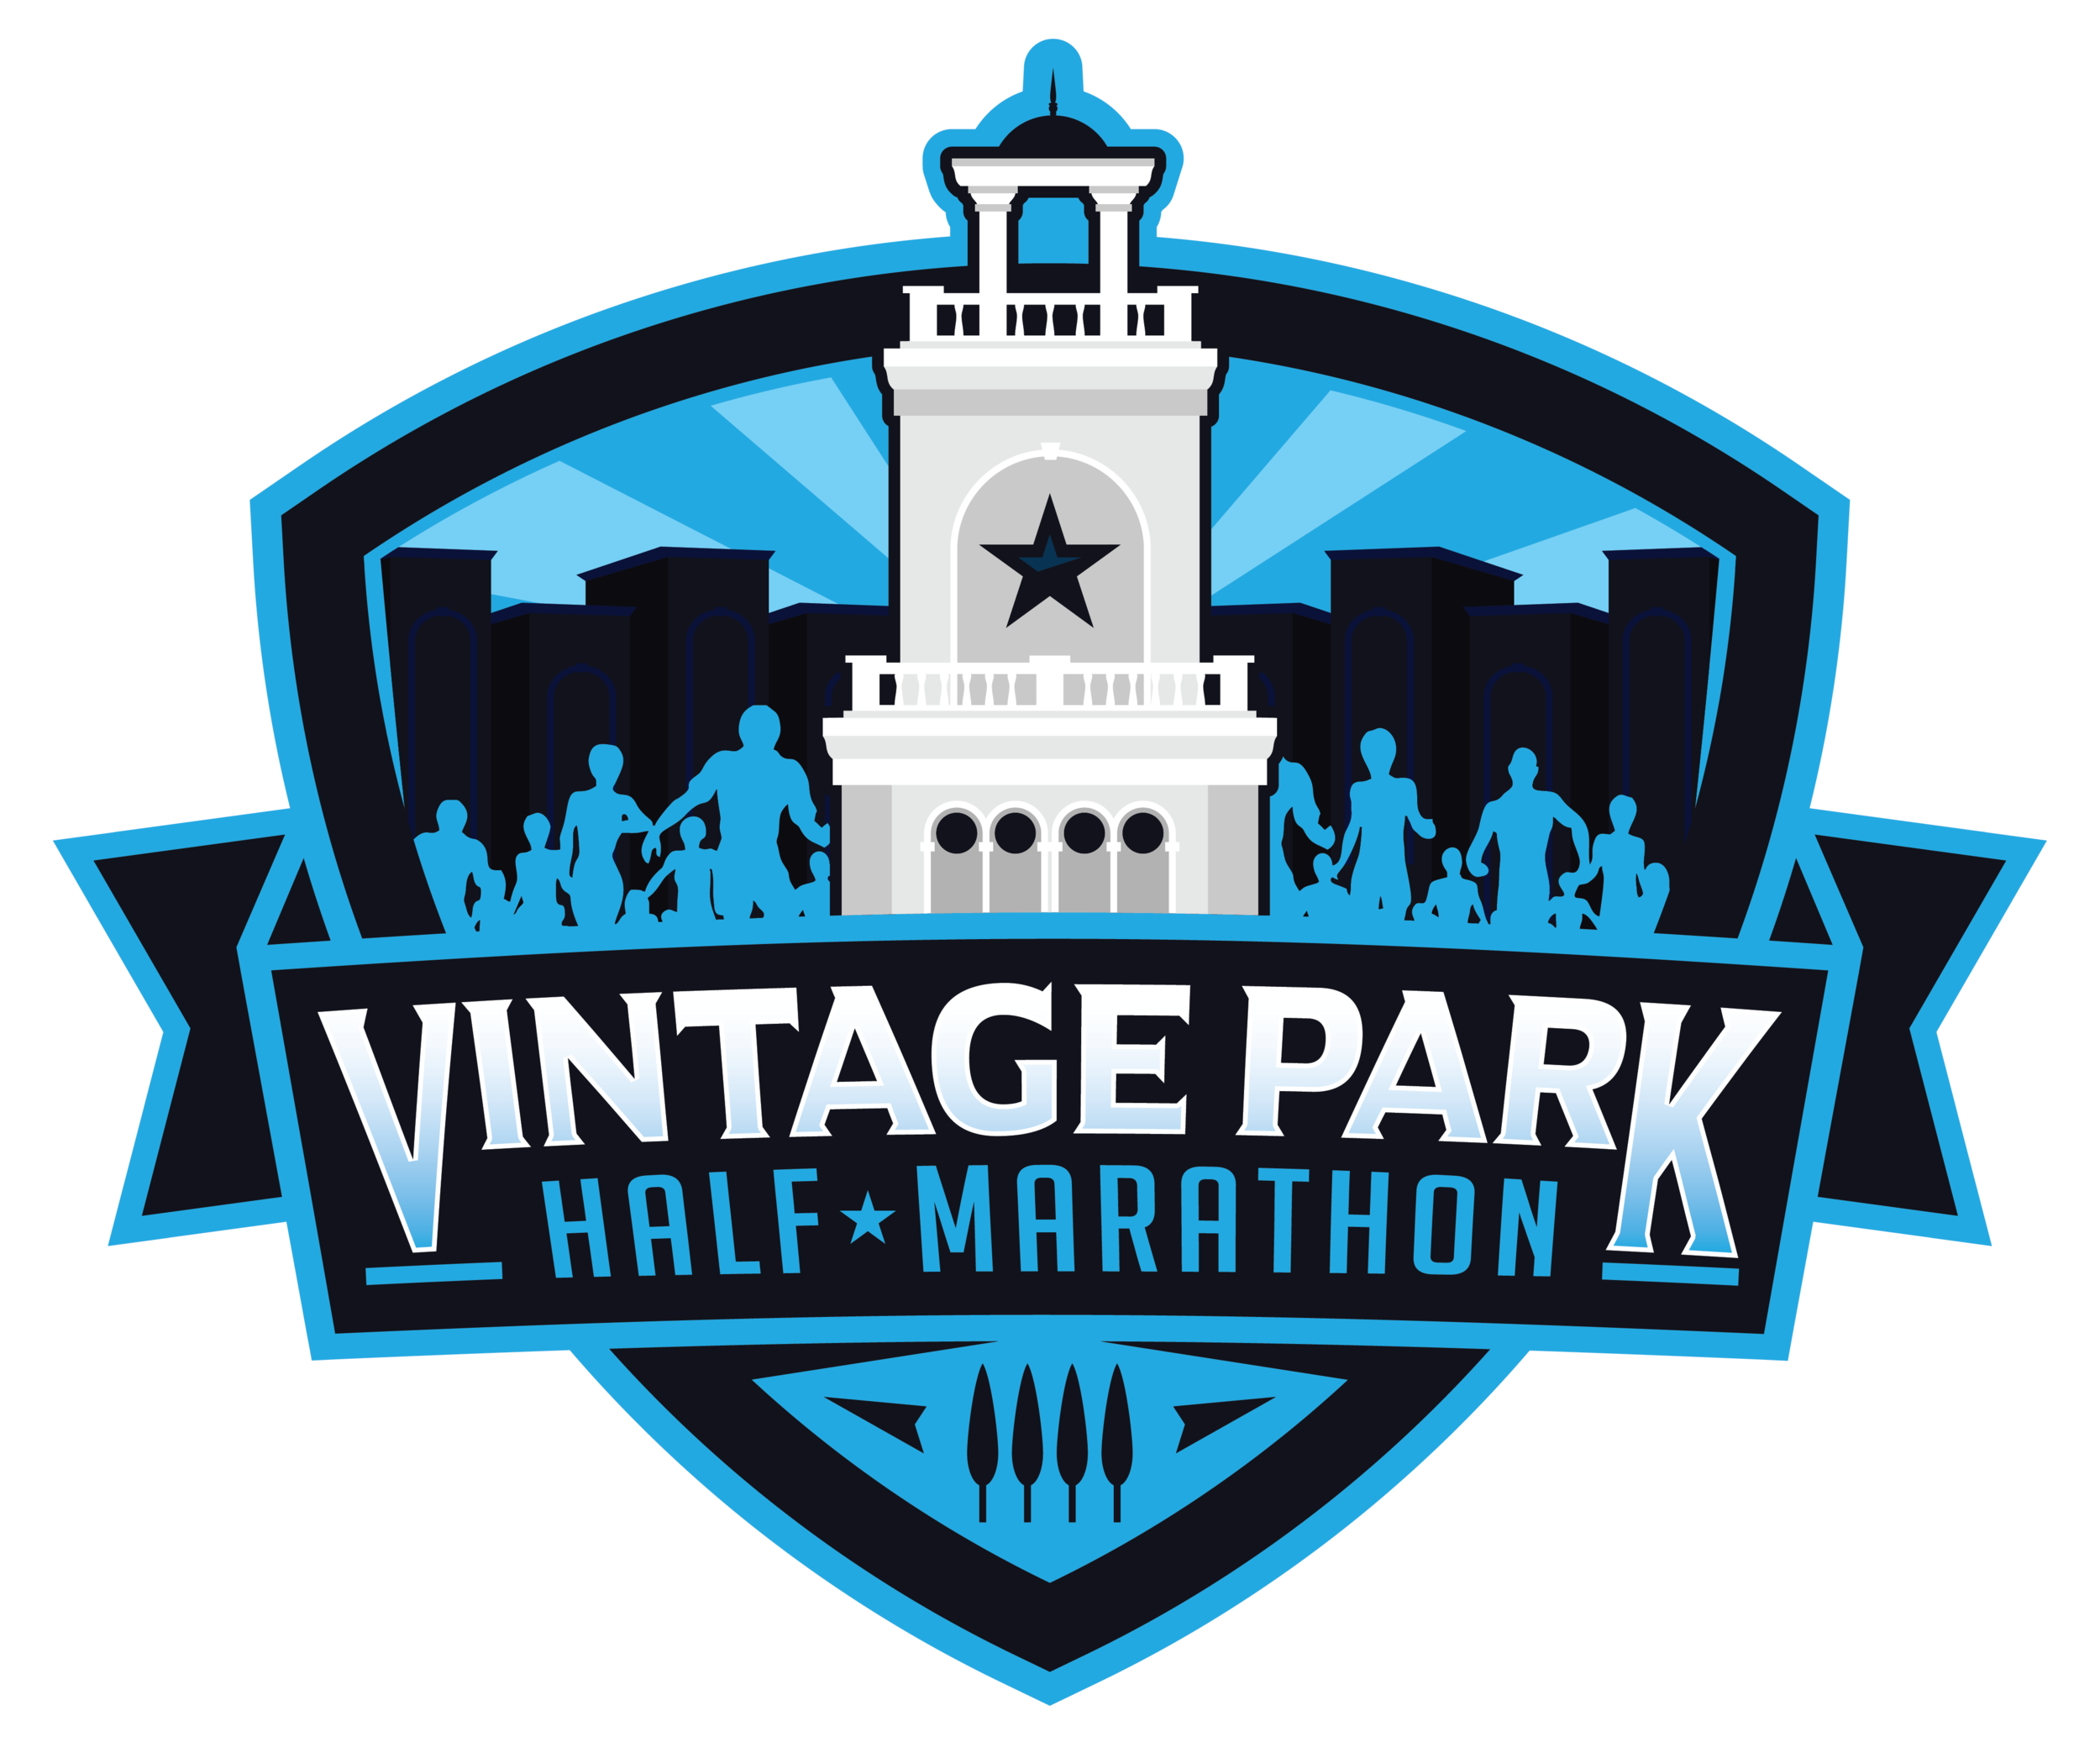 Vintage Park Half Marathon